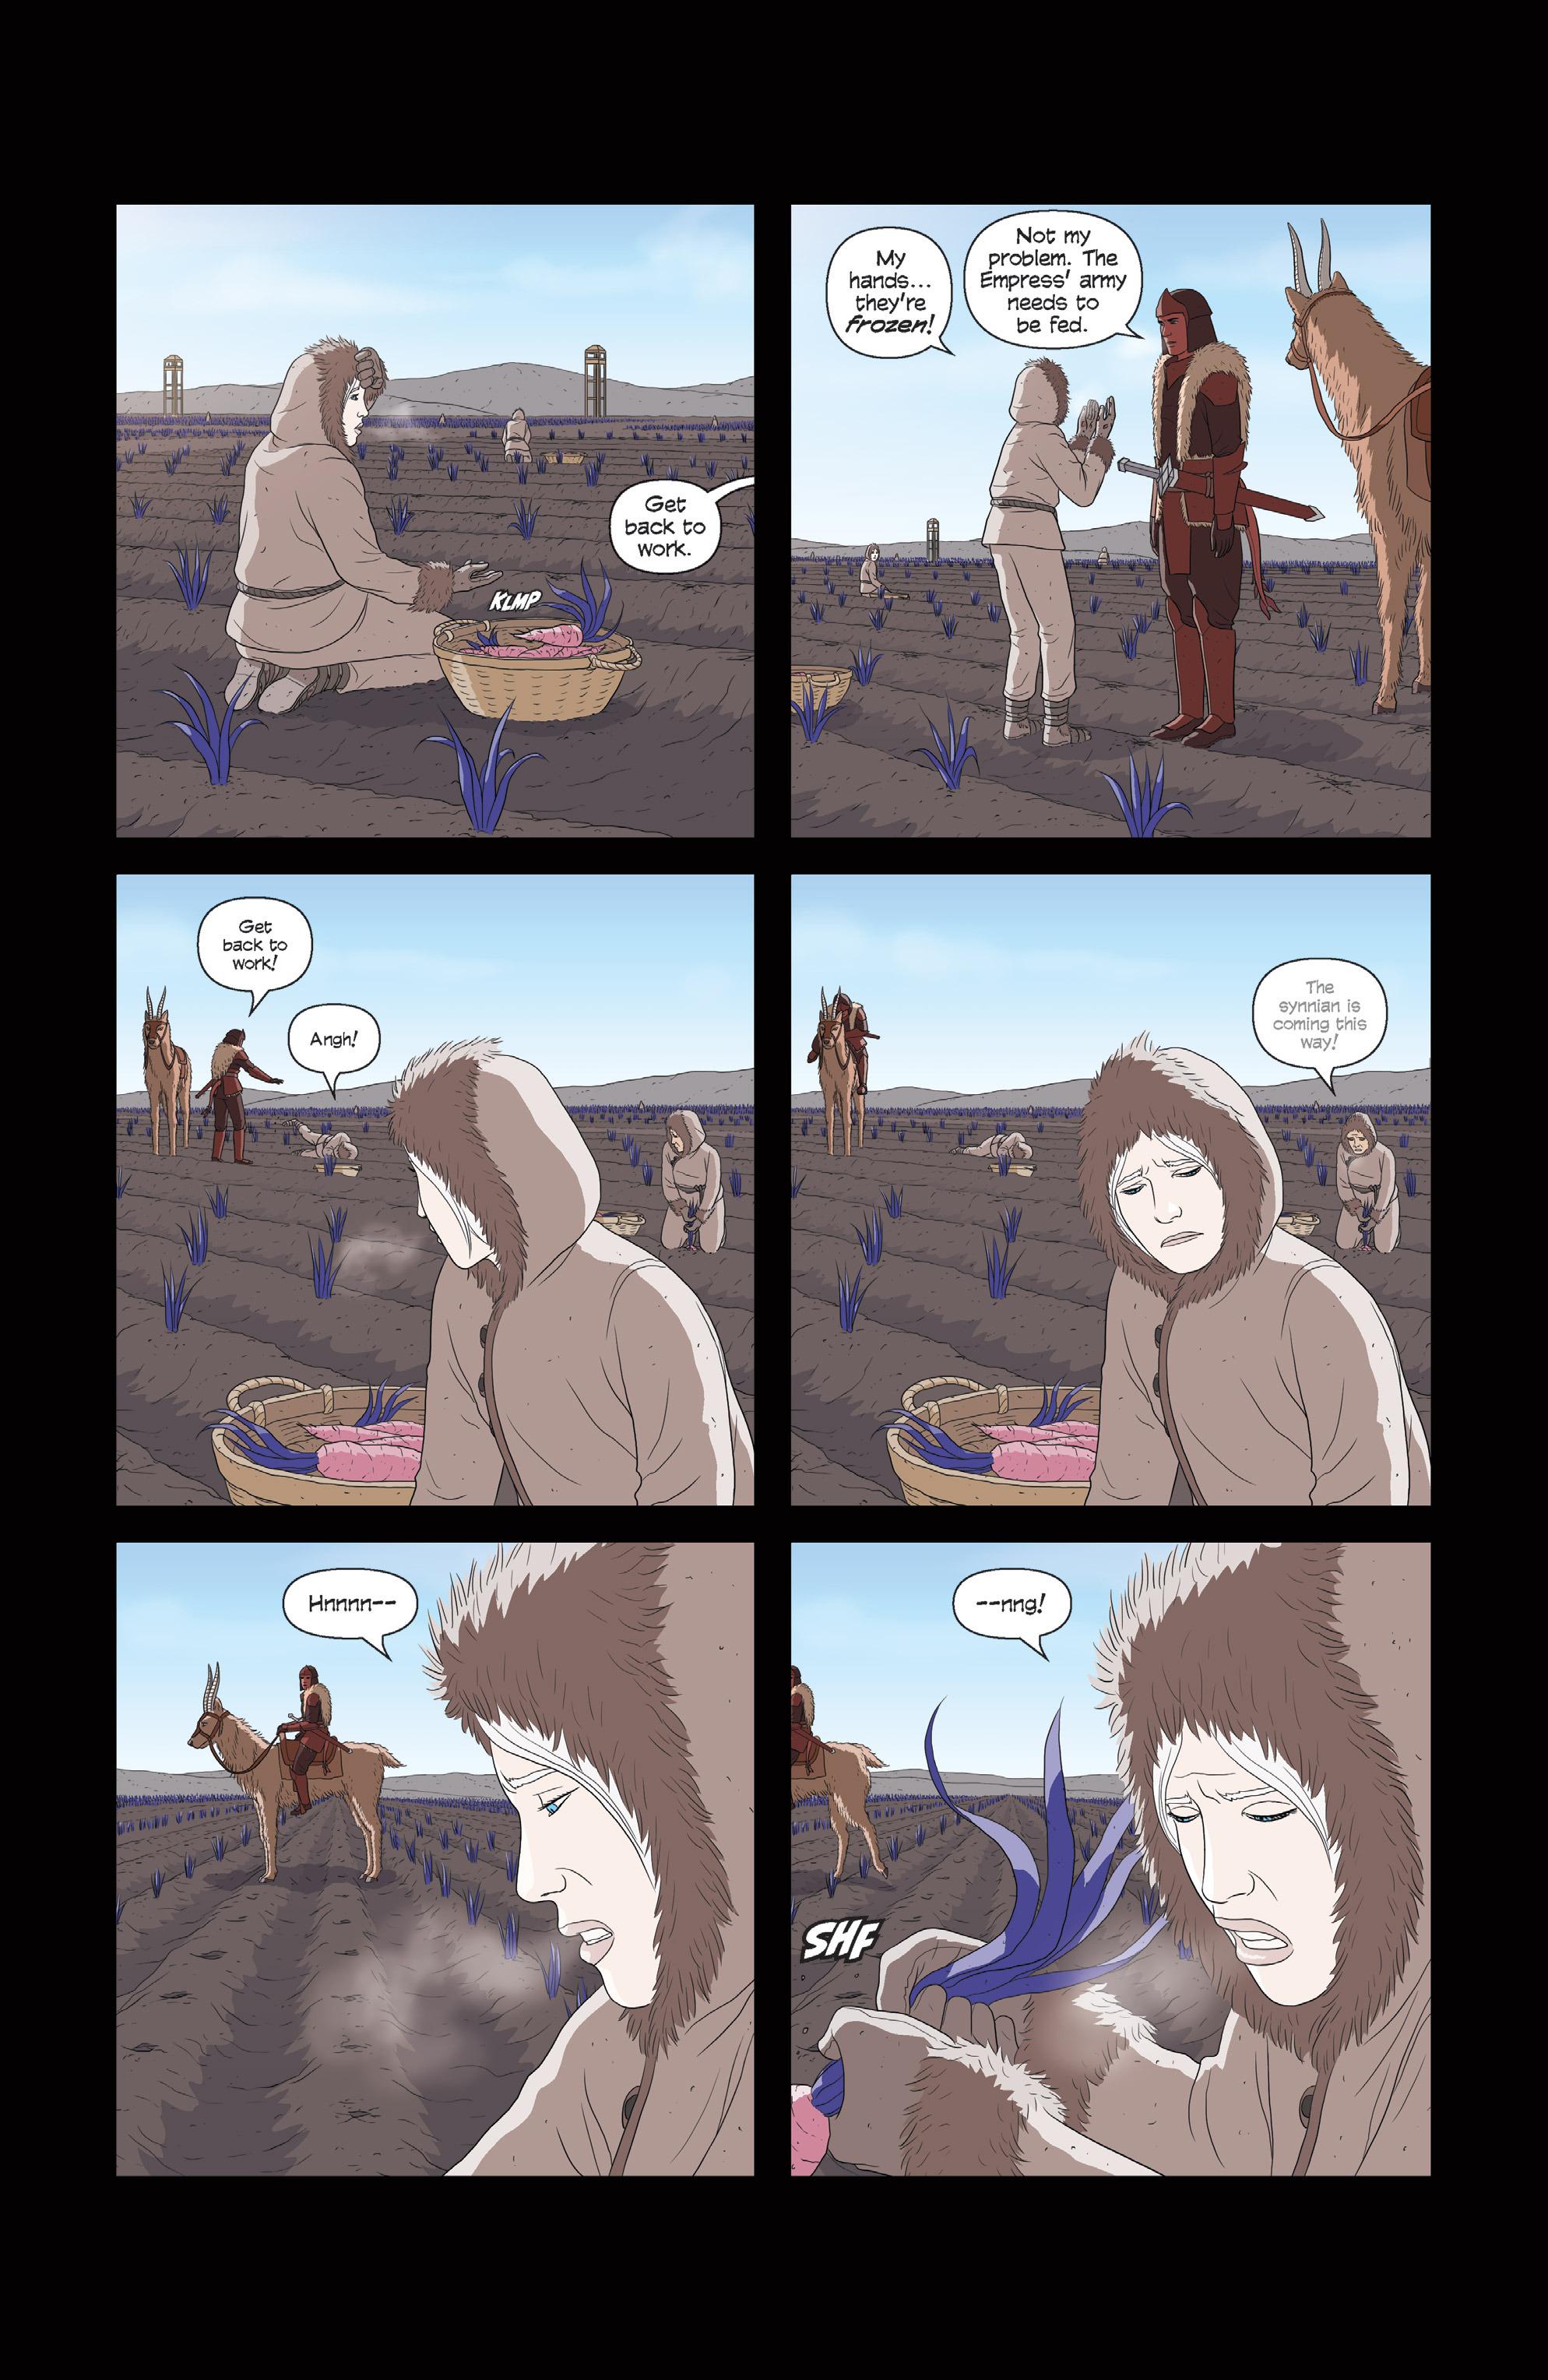 Read online Ringside comic -  Issue #10 - 24